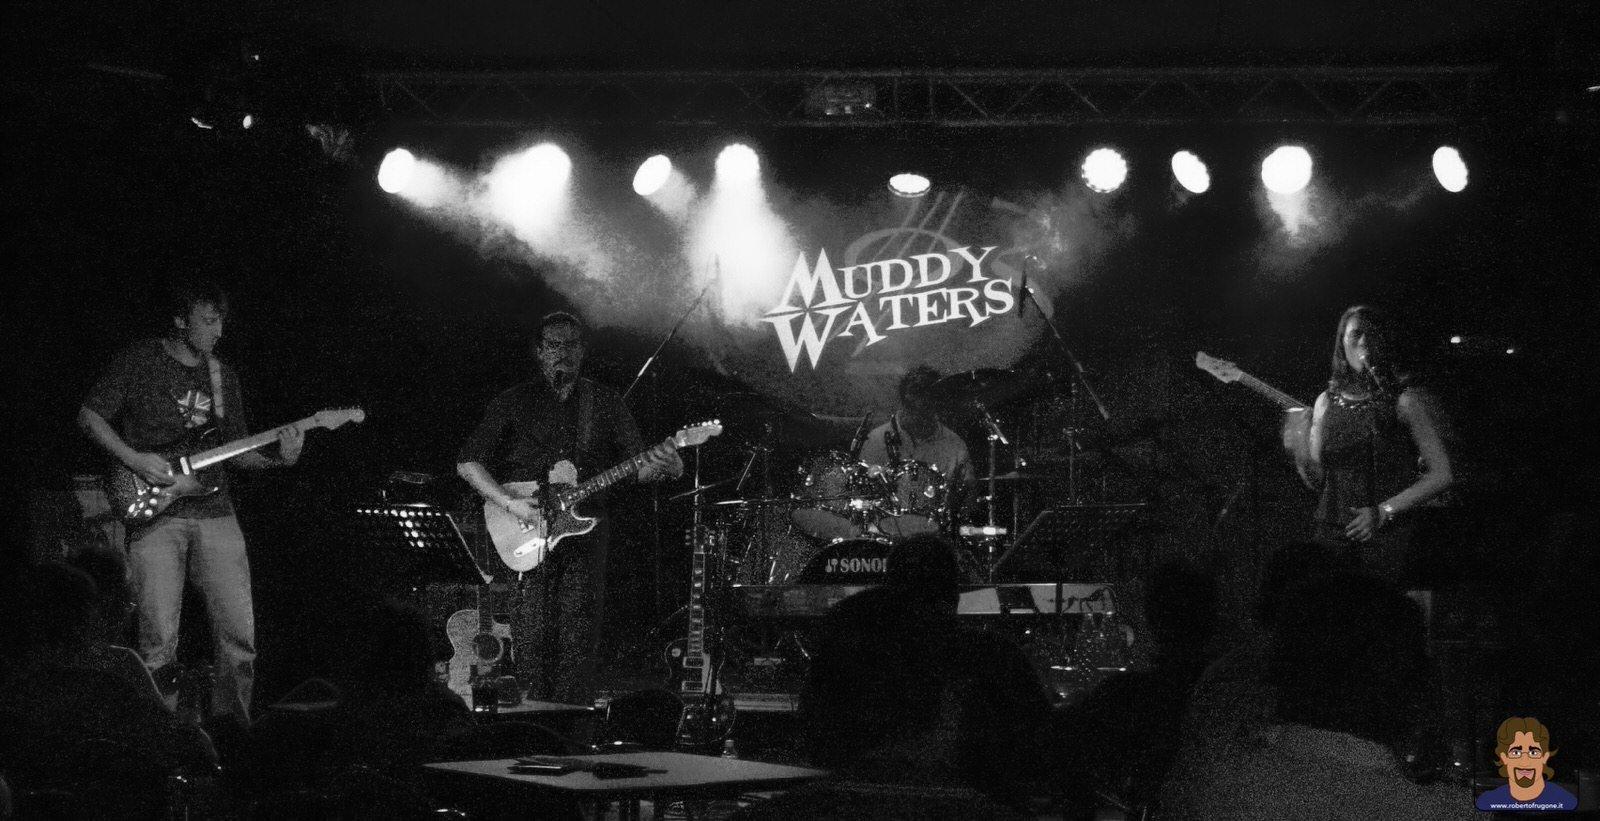 Roberto Frugone Band cantautore live concerto Calvari Muddy Waters 02